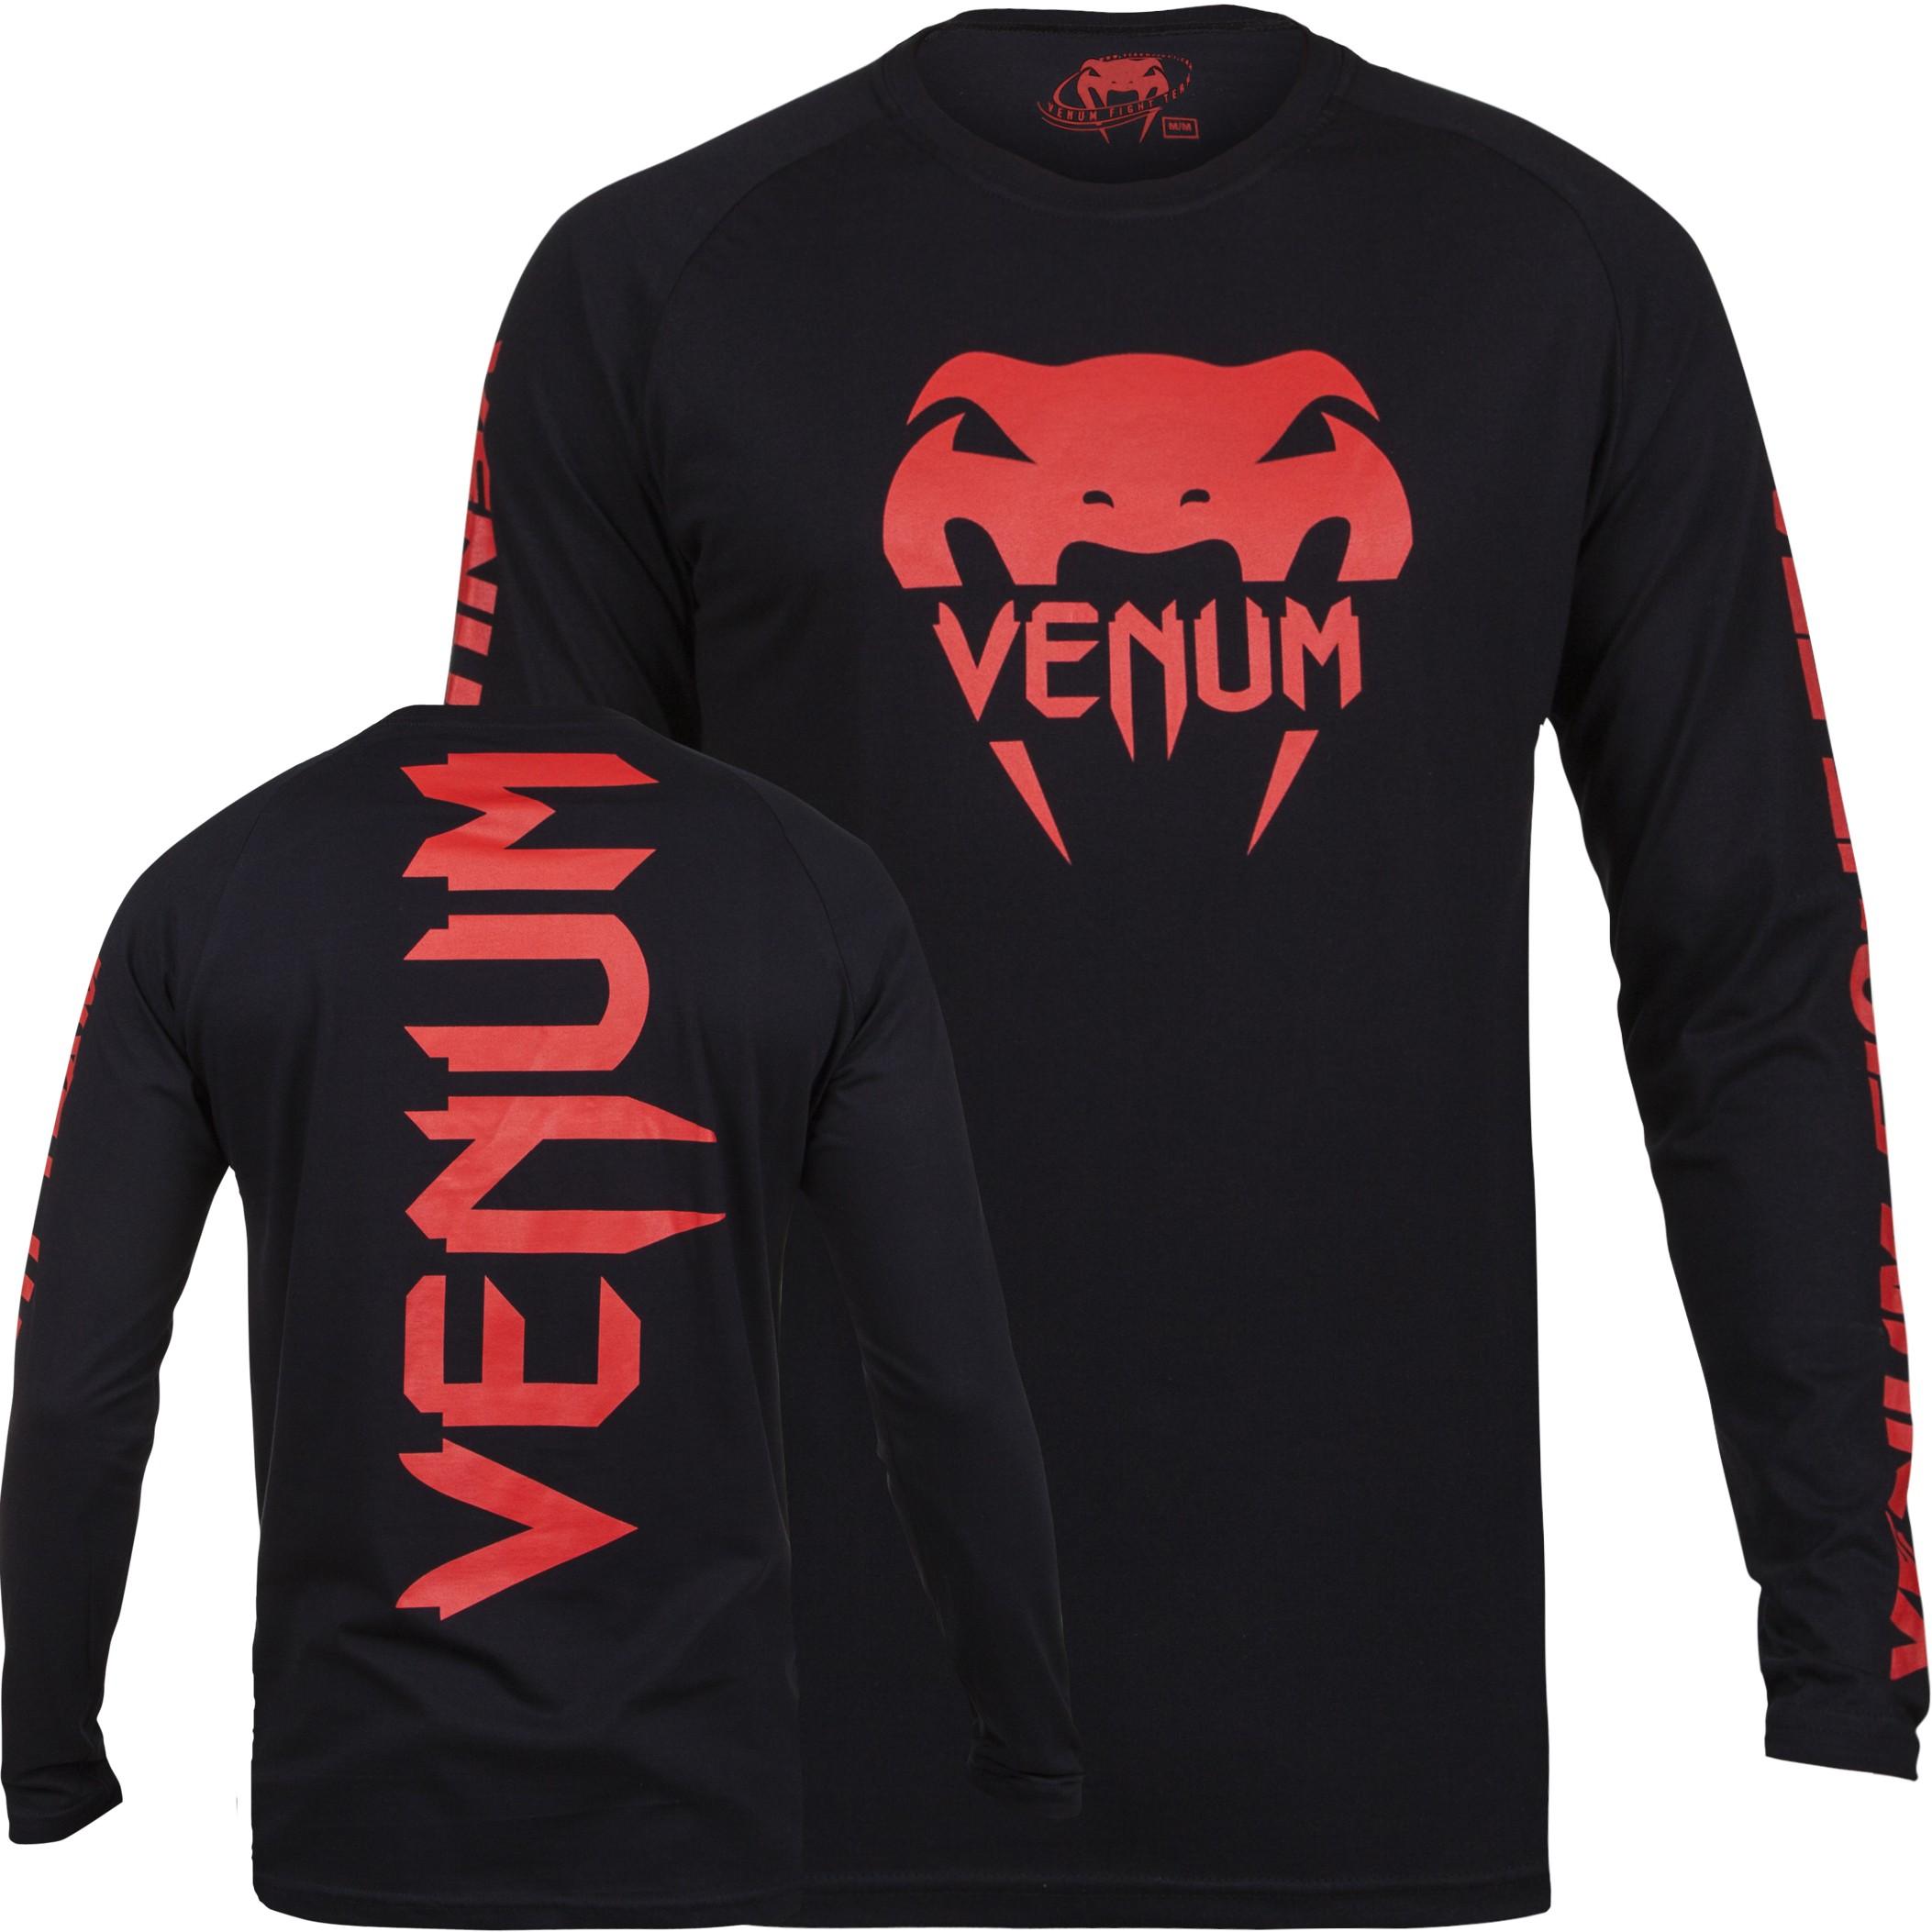 Футболка мужская MMA  Venum Pro Team 2.0 UFC футболка мужская mma a3 ufc venum team shogun tap out